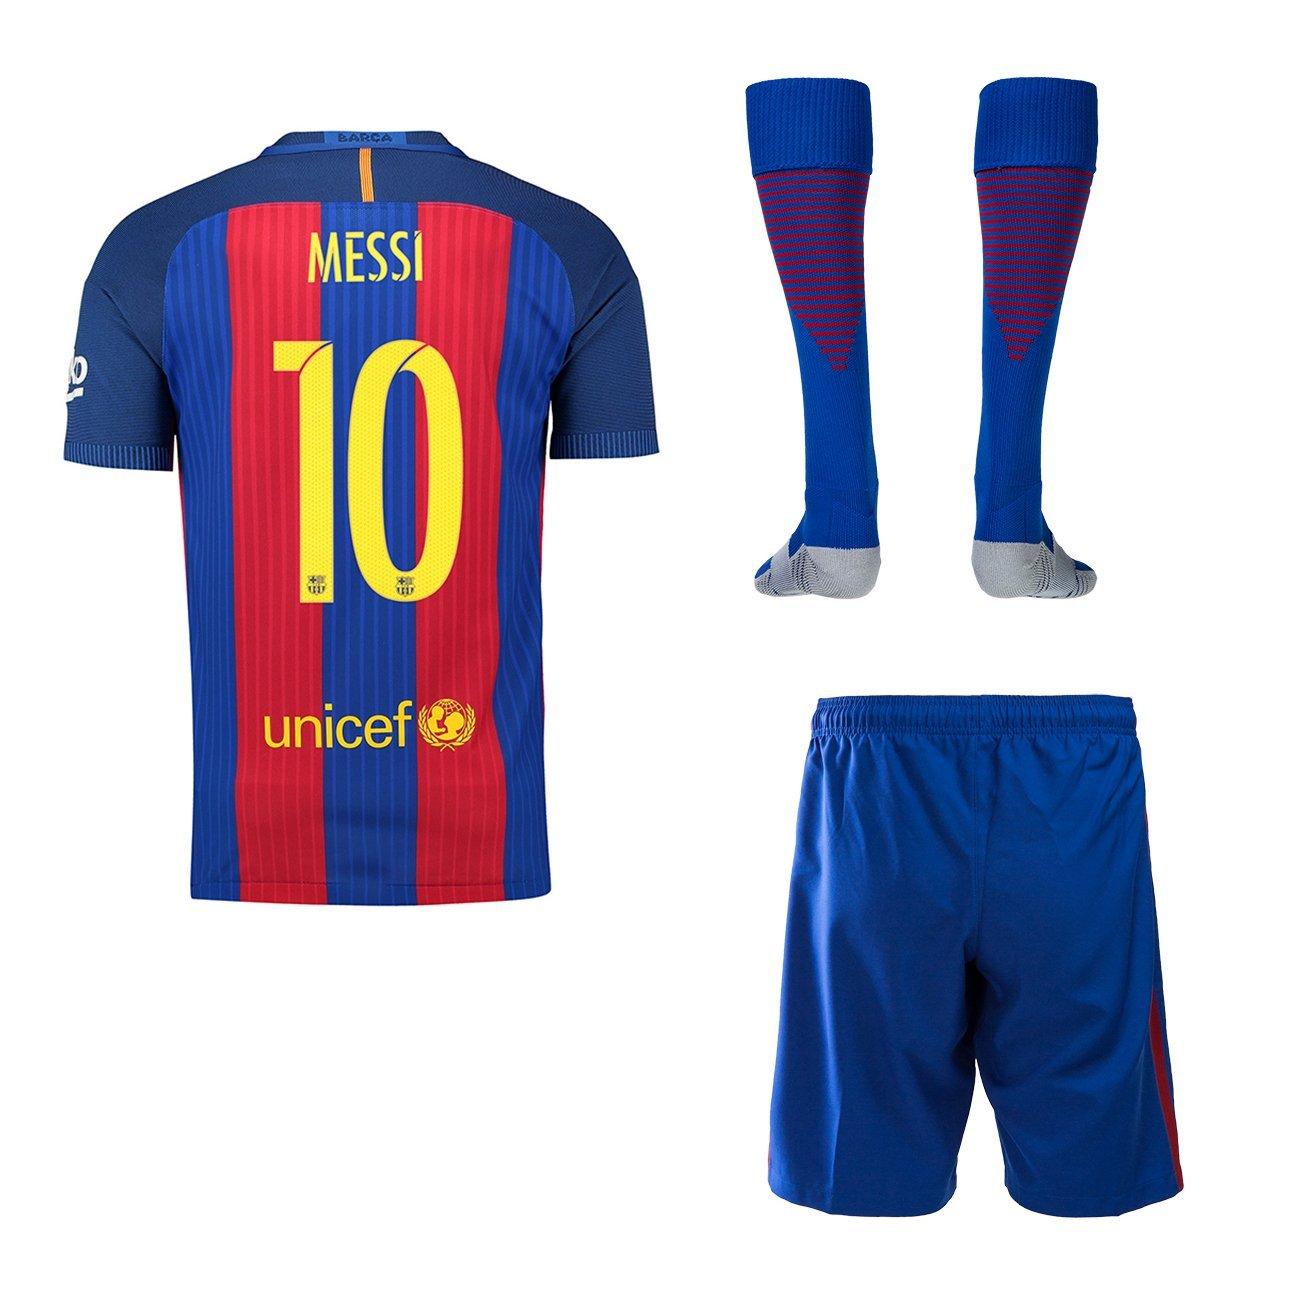 finest selection efbe0 6dcf2 Buy 2016/2017 Barcelona Home #10 Messi Kids Soccer Wear ...